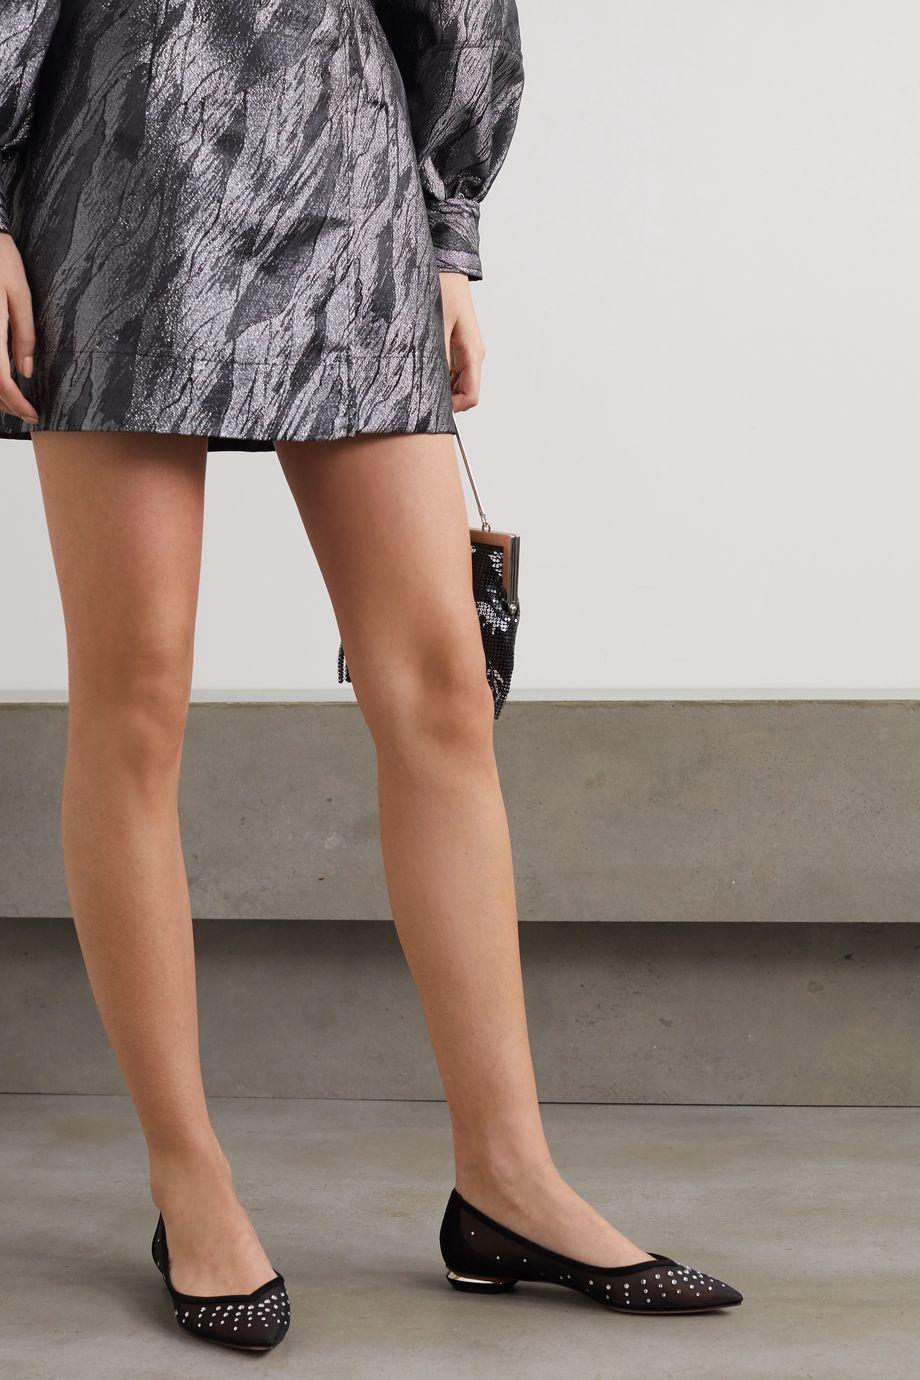 Nicholas Kirkwood Lexi suede-trimmed crystal-embellished mesh point-toe flats